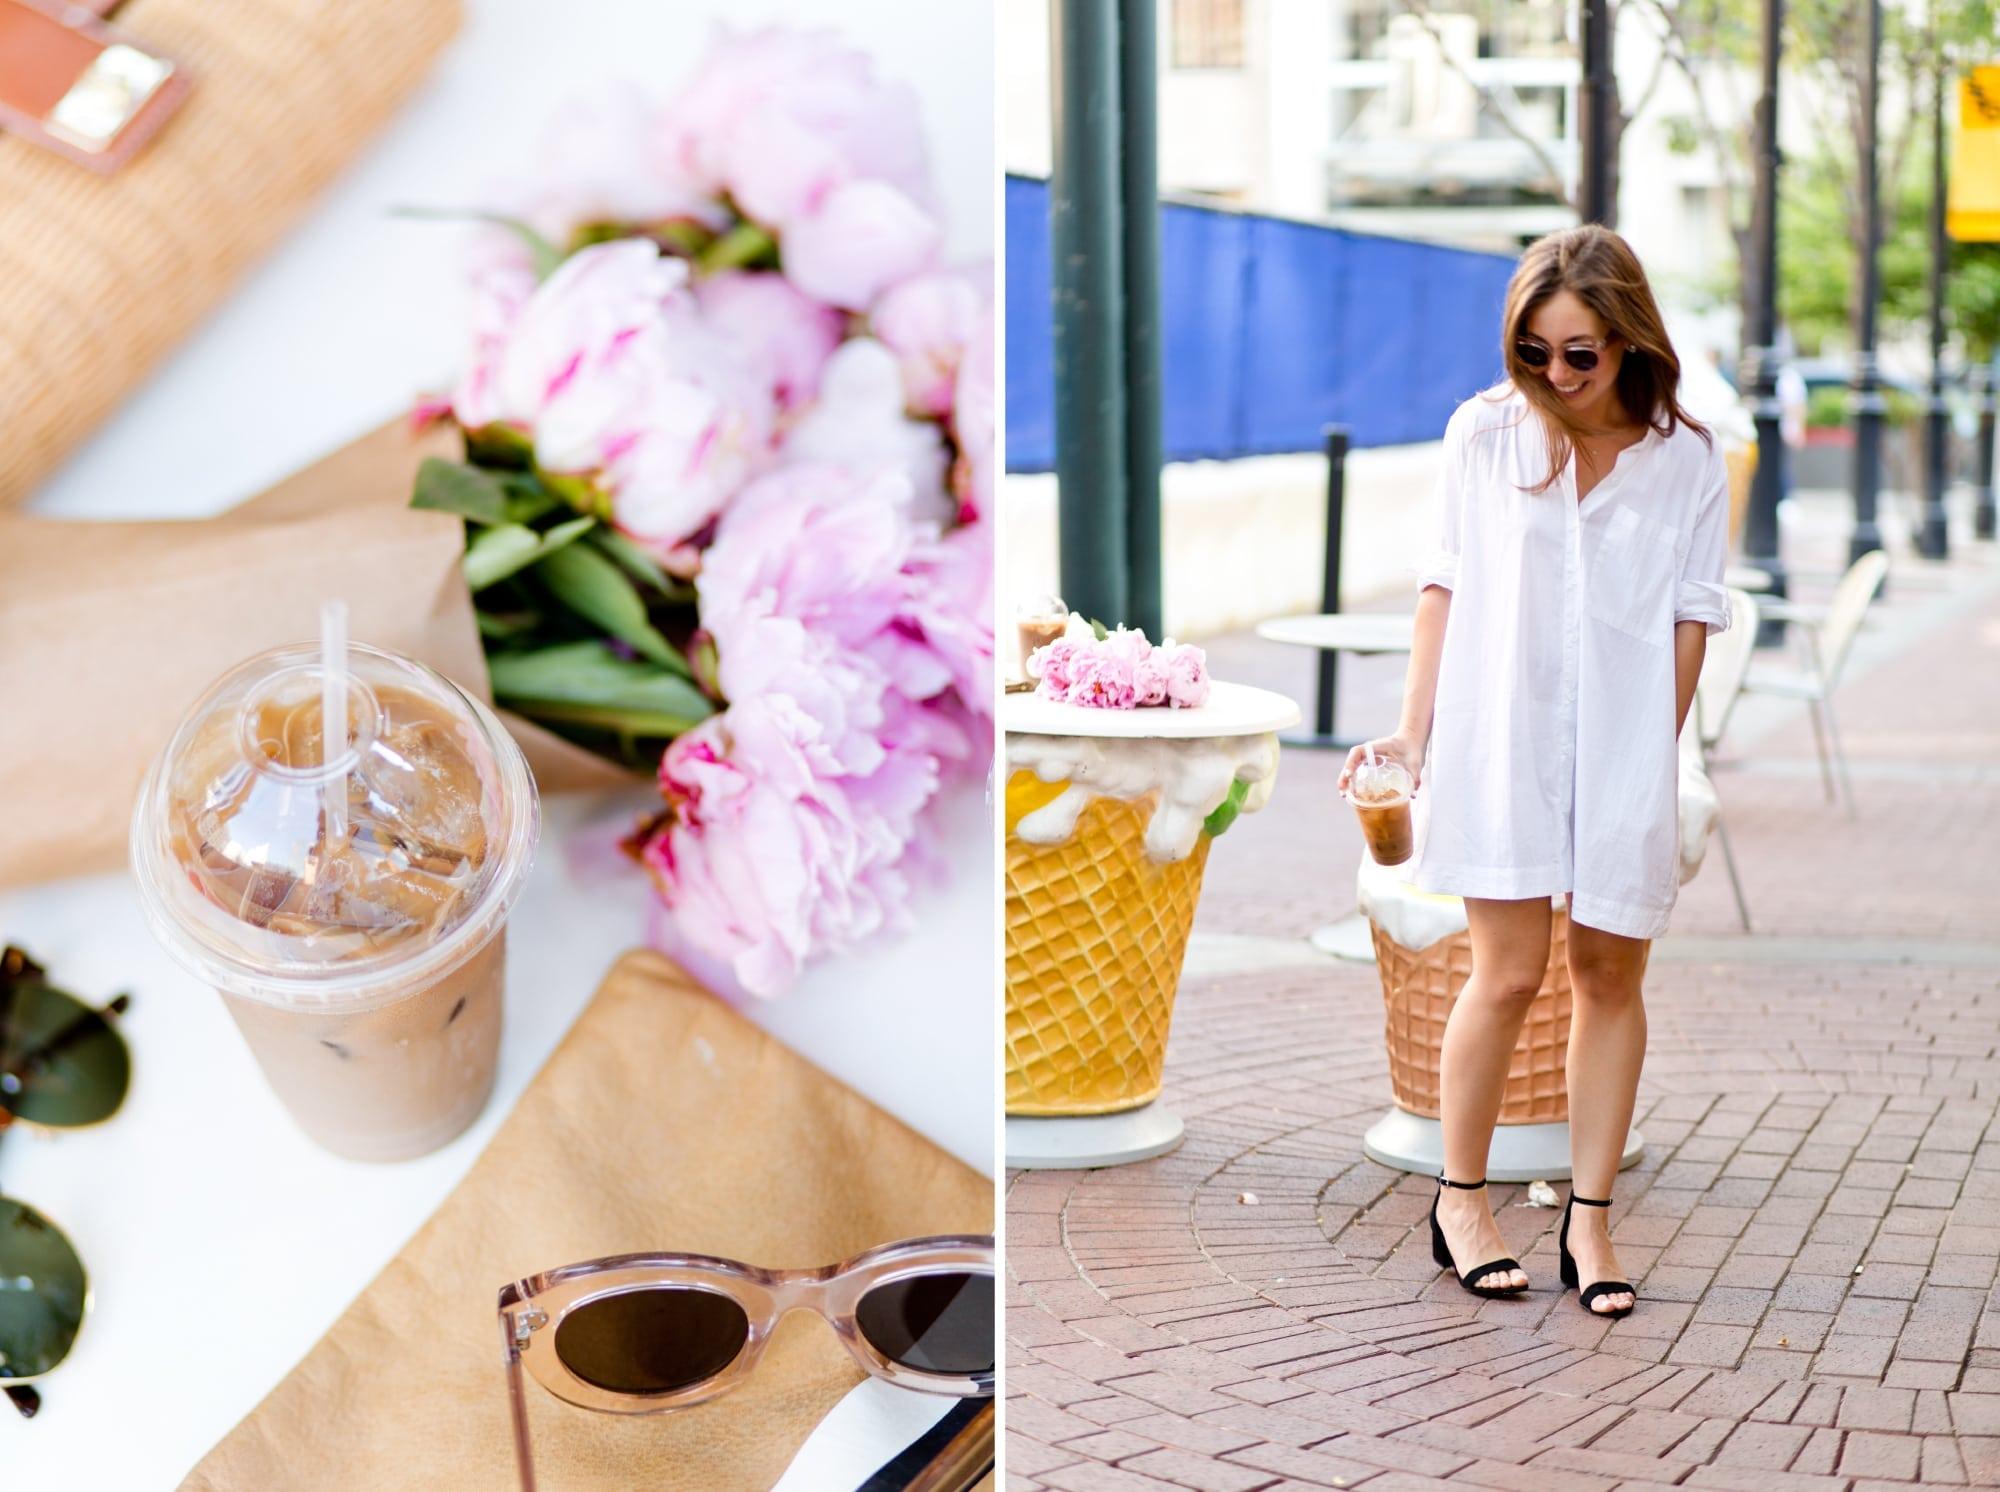 Pink Peonies and White Shirtdress